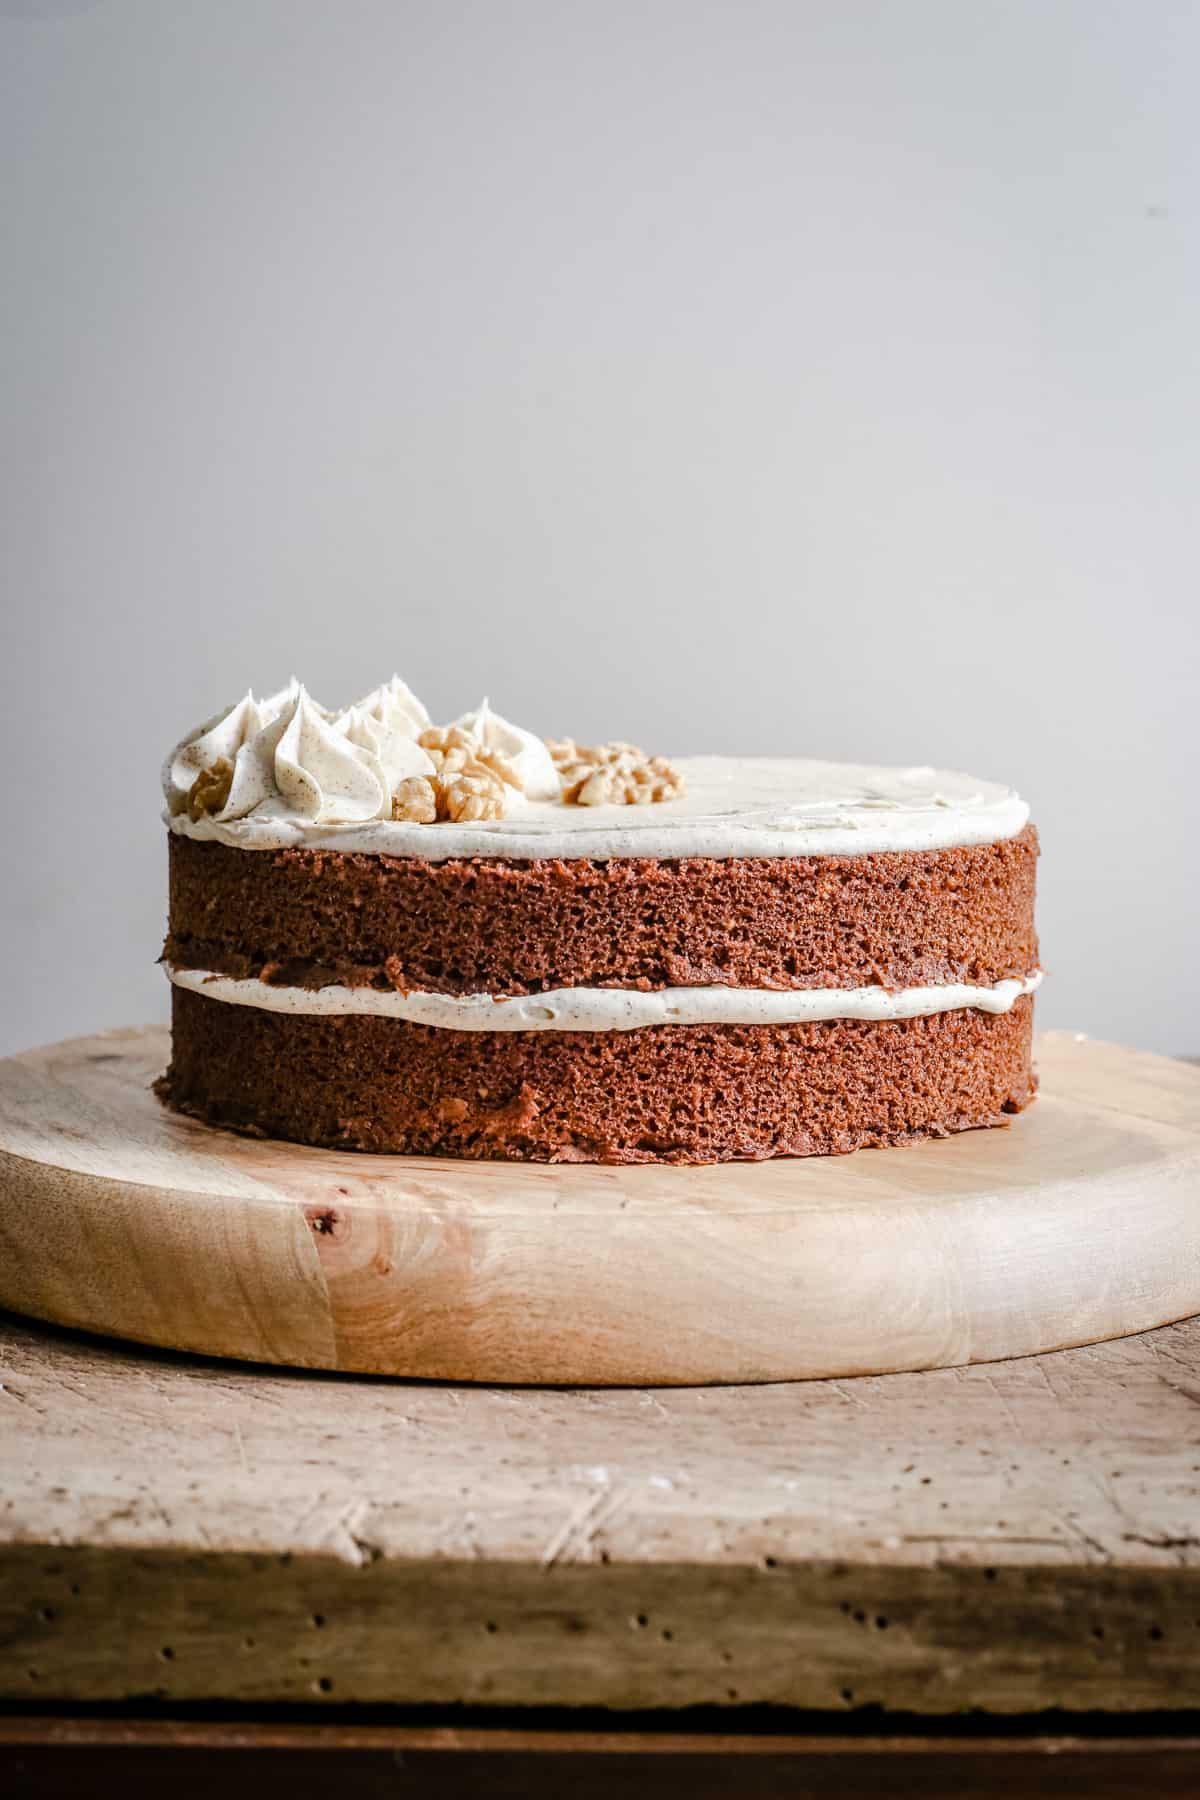 gluten-free Coffee and Walnut Cake on a wooden board